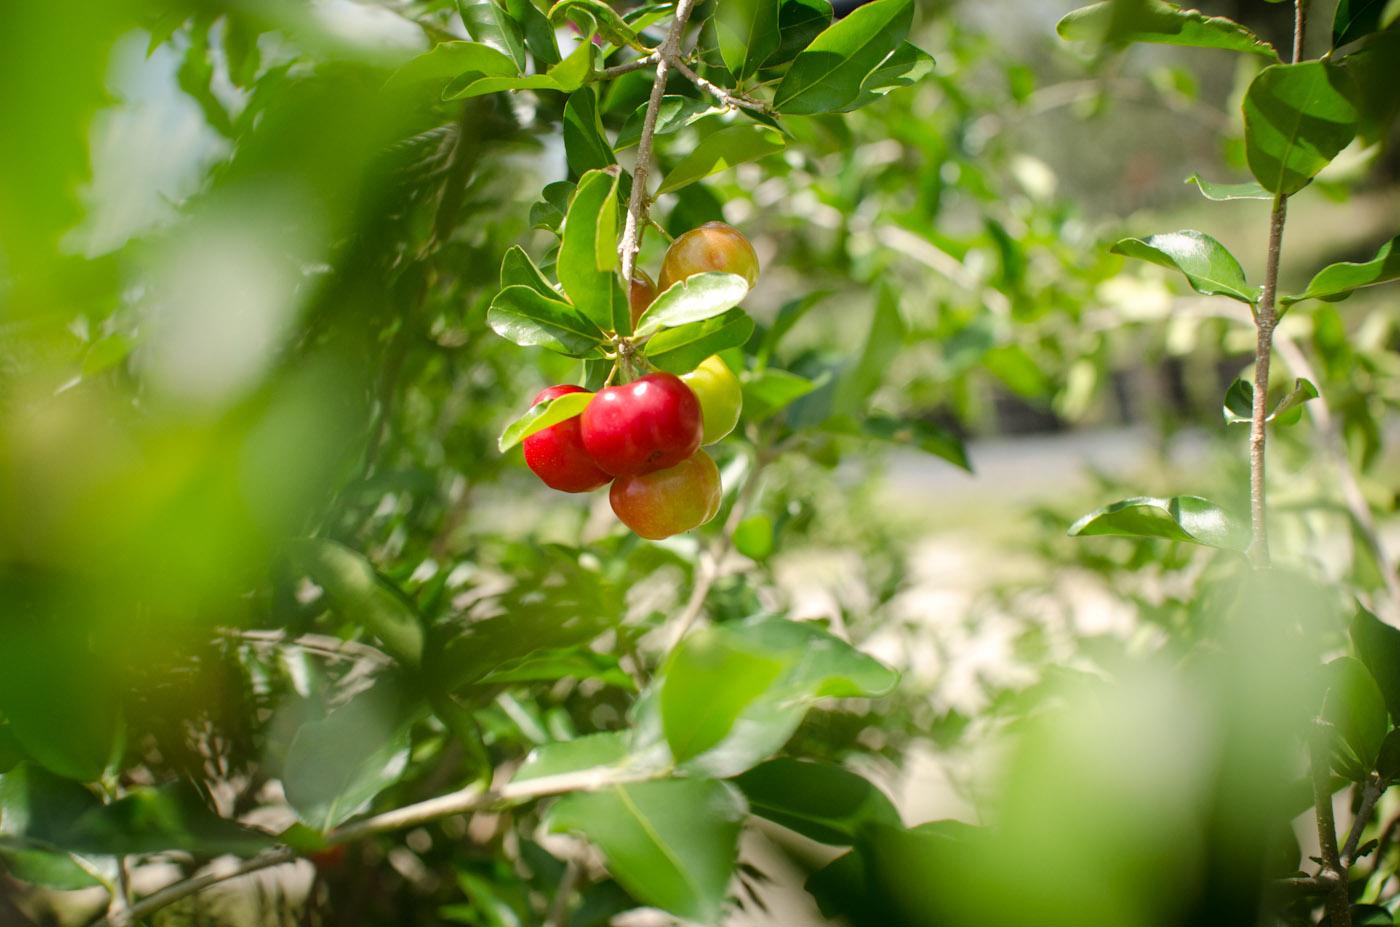 barbados cherry fruit-6050.jpg